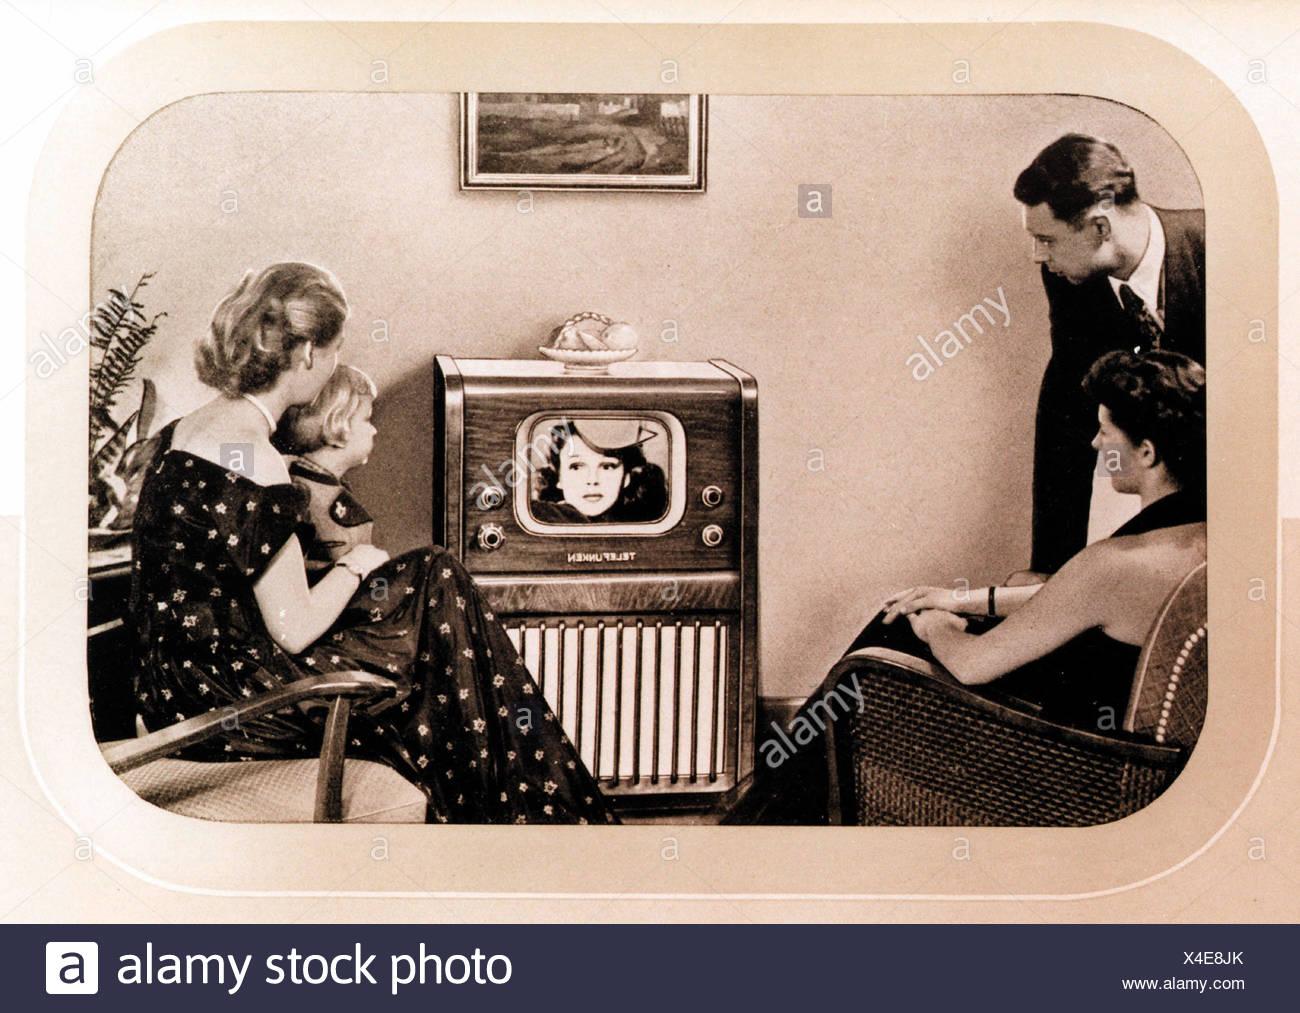 broadcast, television, Telefunken television set FE 8 S, one